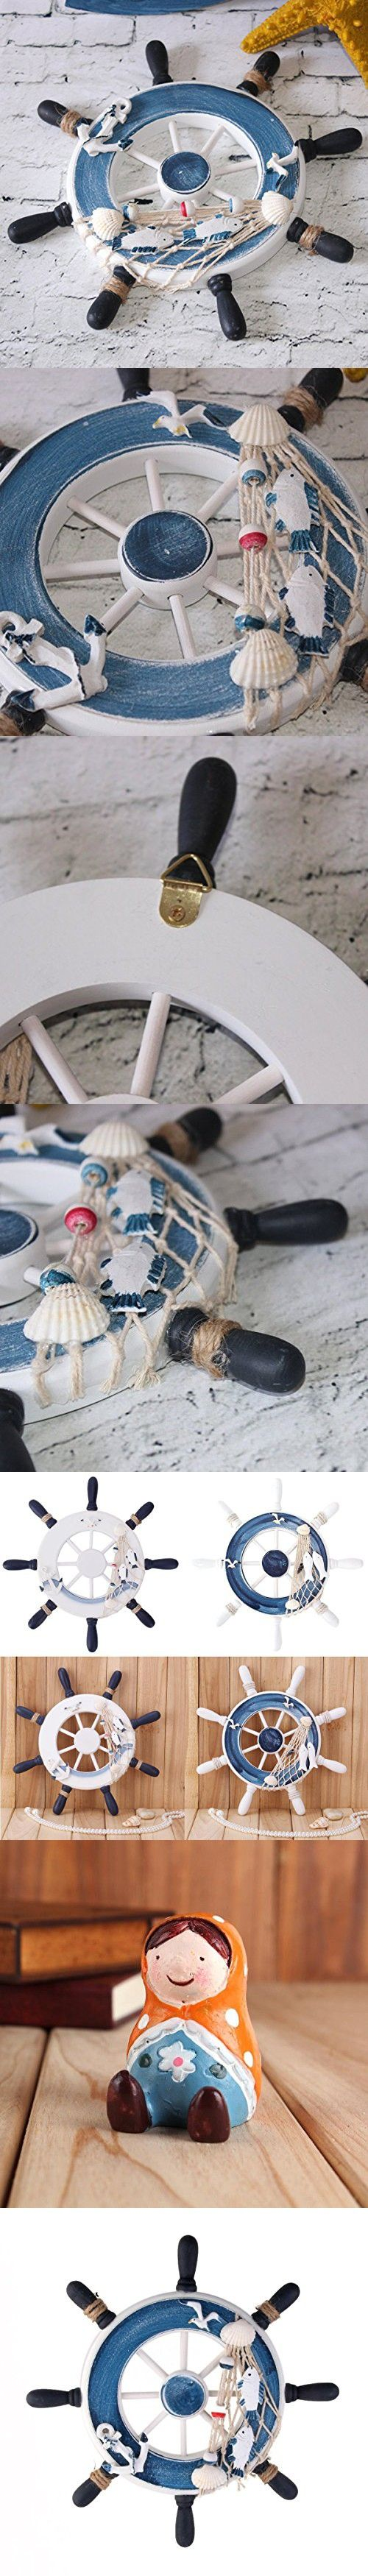 WINOMO Beach Boat Ship Steering Wheel Fishing Net Home Decoration - Blue